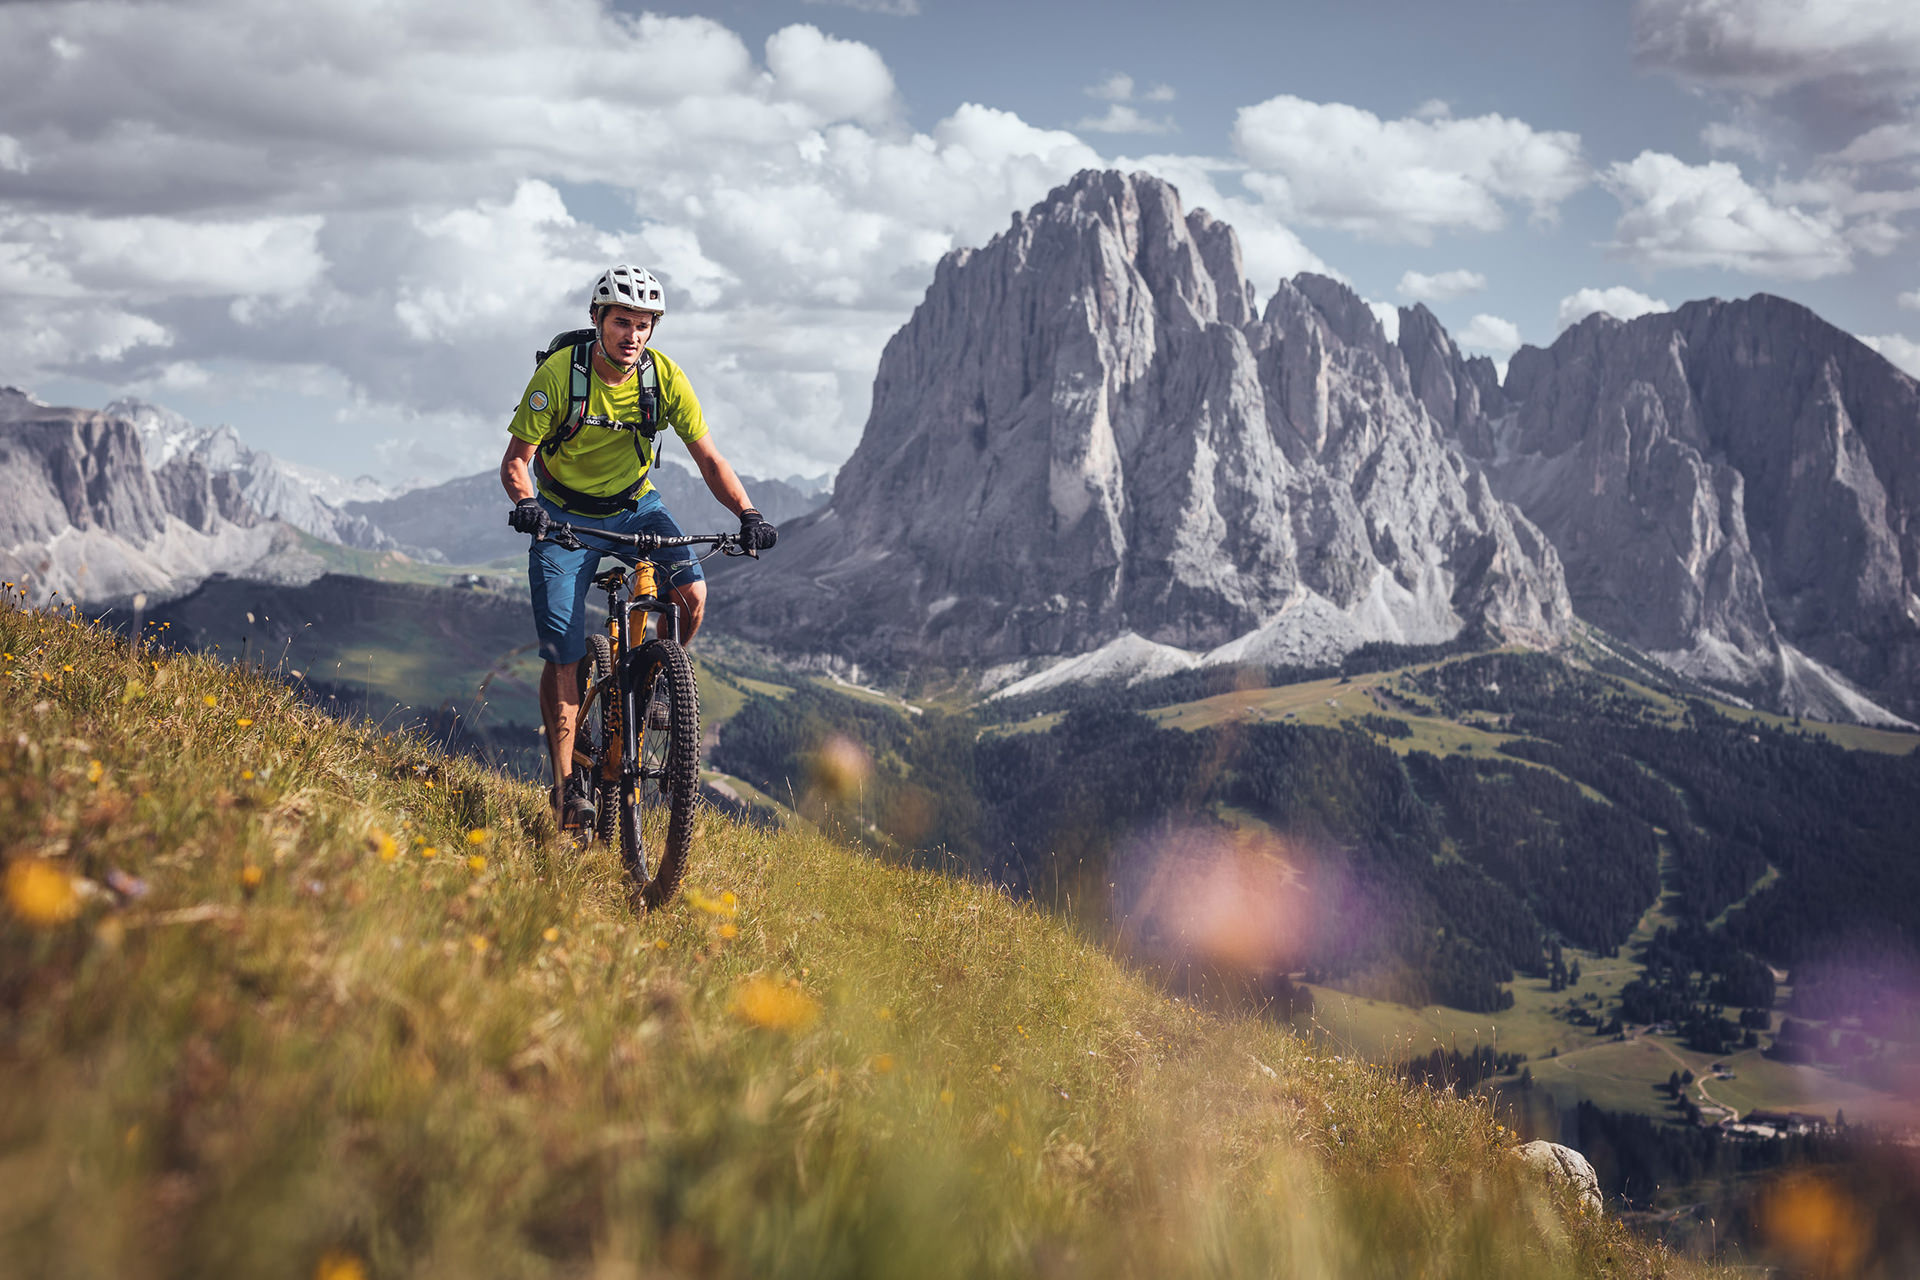 mountainbiken-val-gardena-gebirge-bergwiese